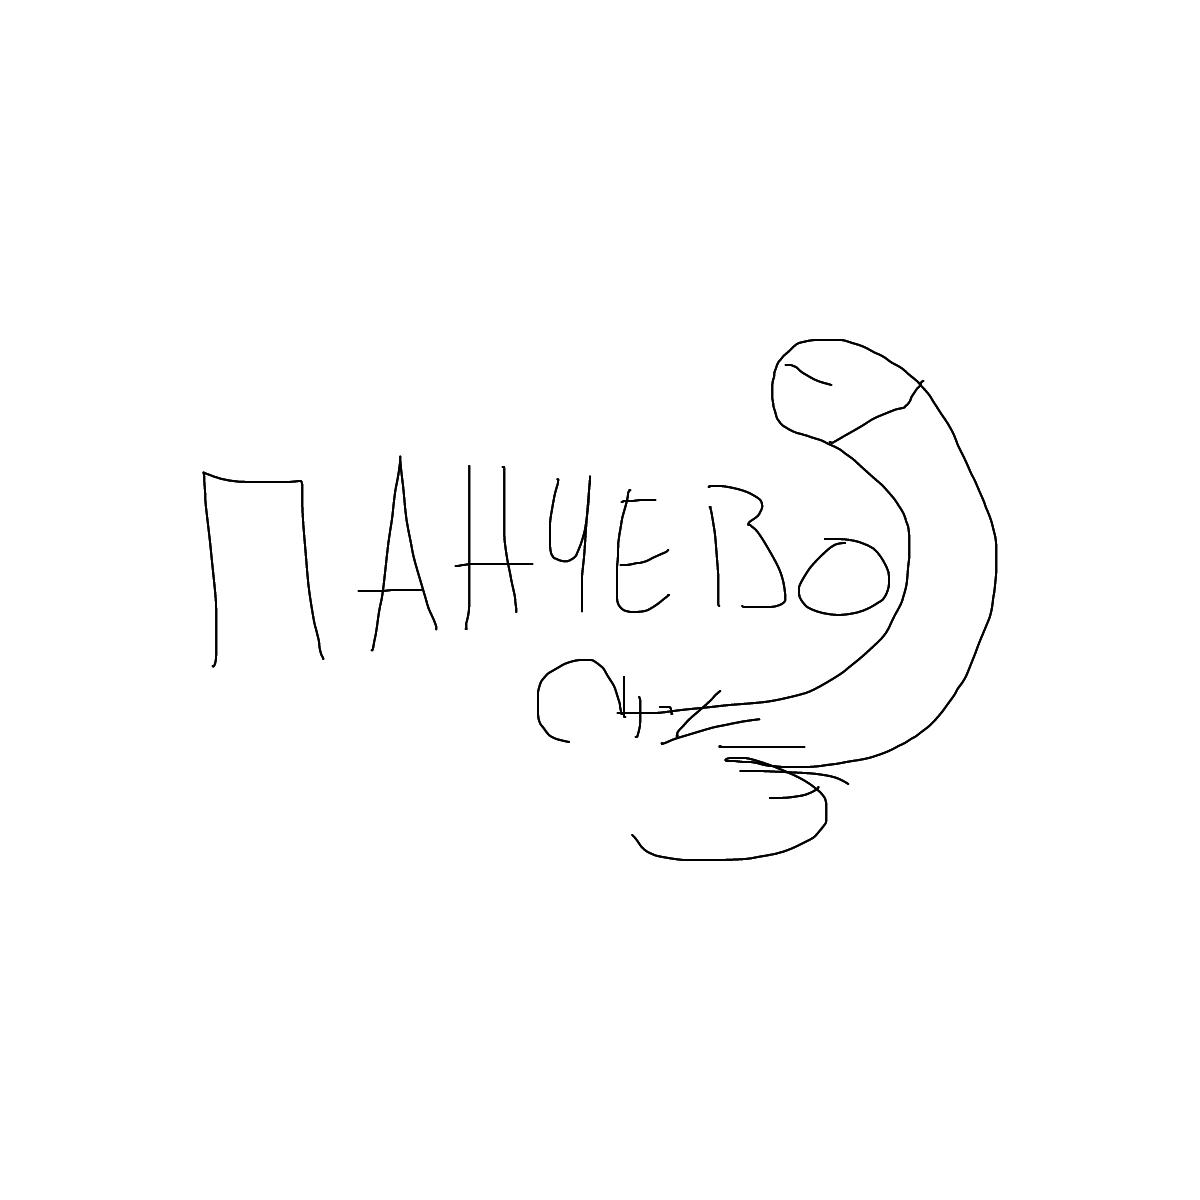 BAAAM drawing#2722 lat:44.8713493347168000lng: 20.6329574584960940